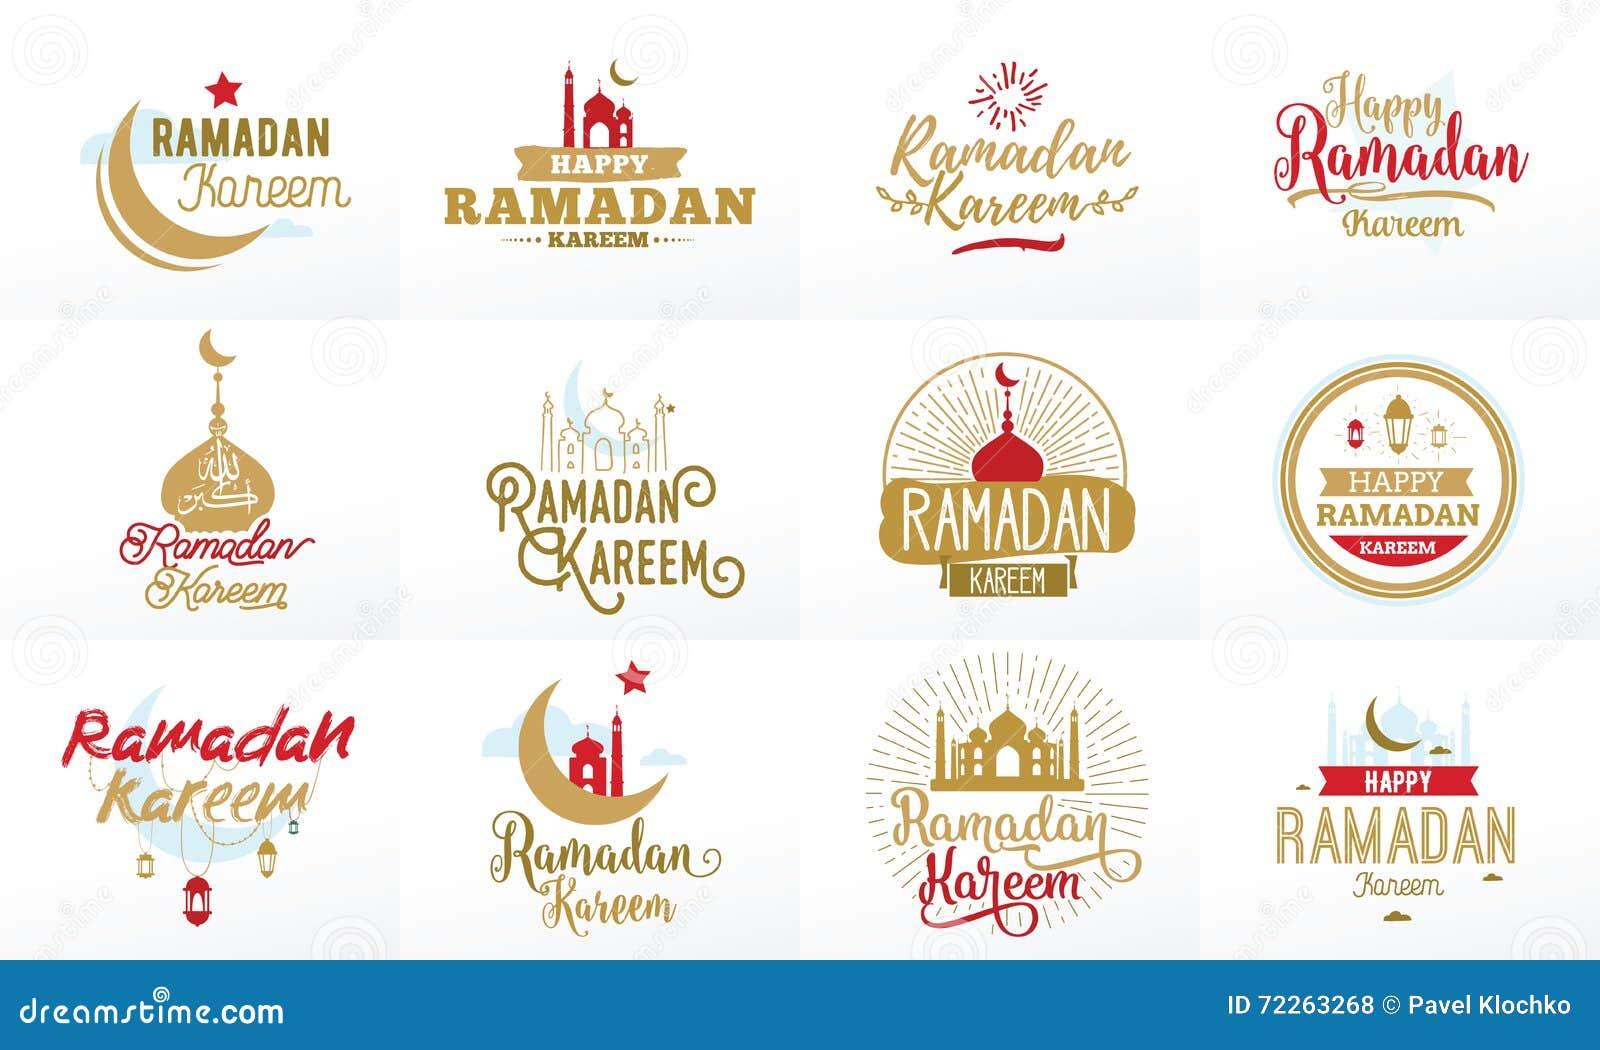 Ramadan Kareem Grupo tipográfico do projeto do vetor